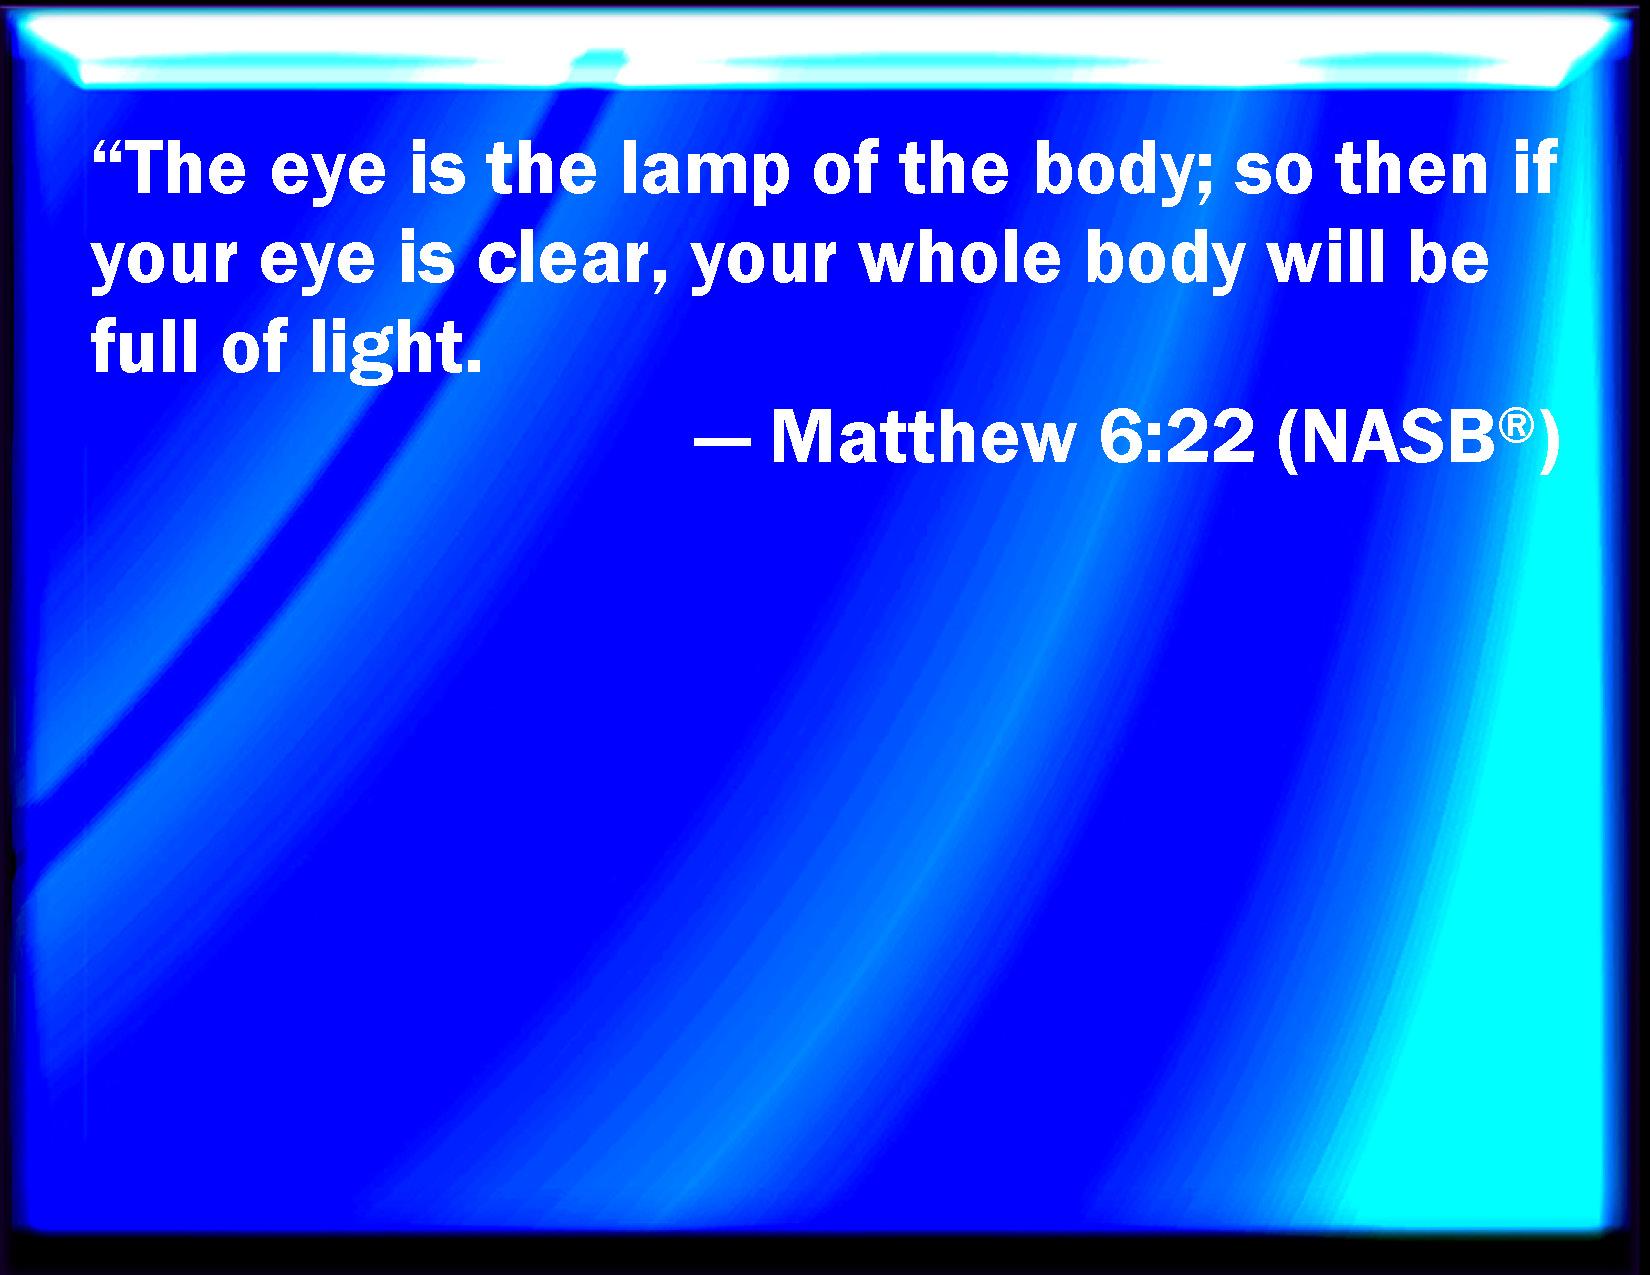 THE NEW AMERICAN BIBLE SAINT JOSEPH EDITION CATHOLIC LARGE TYPE ILLUSTRATED RED